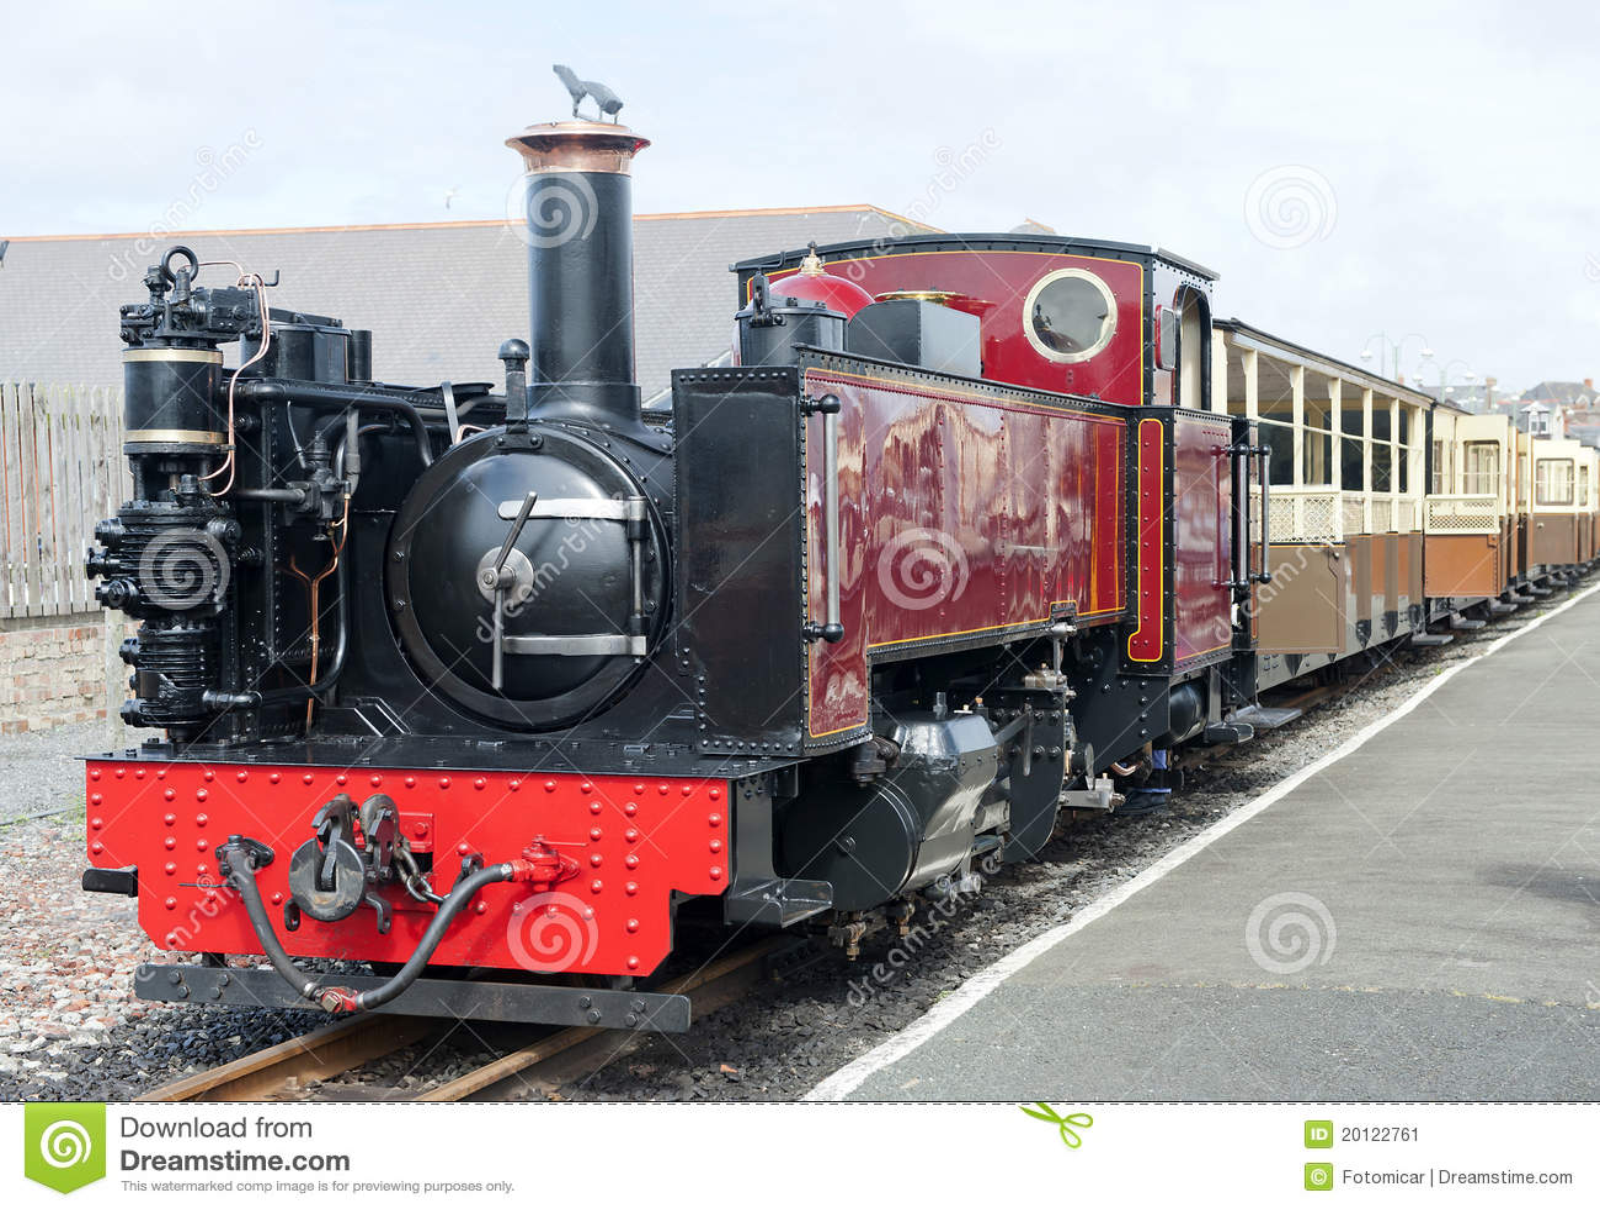 Old Vintage Steam Railway Engine Stock Image - Image: 20122761